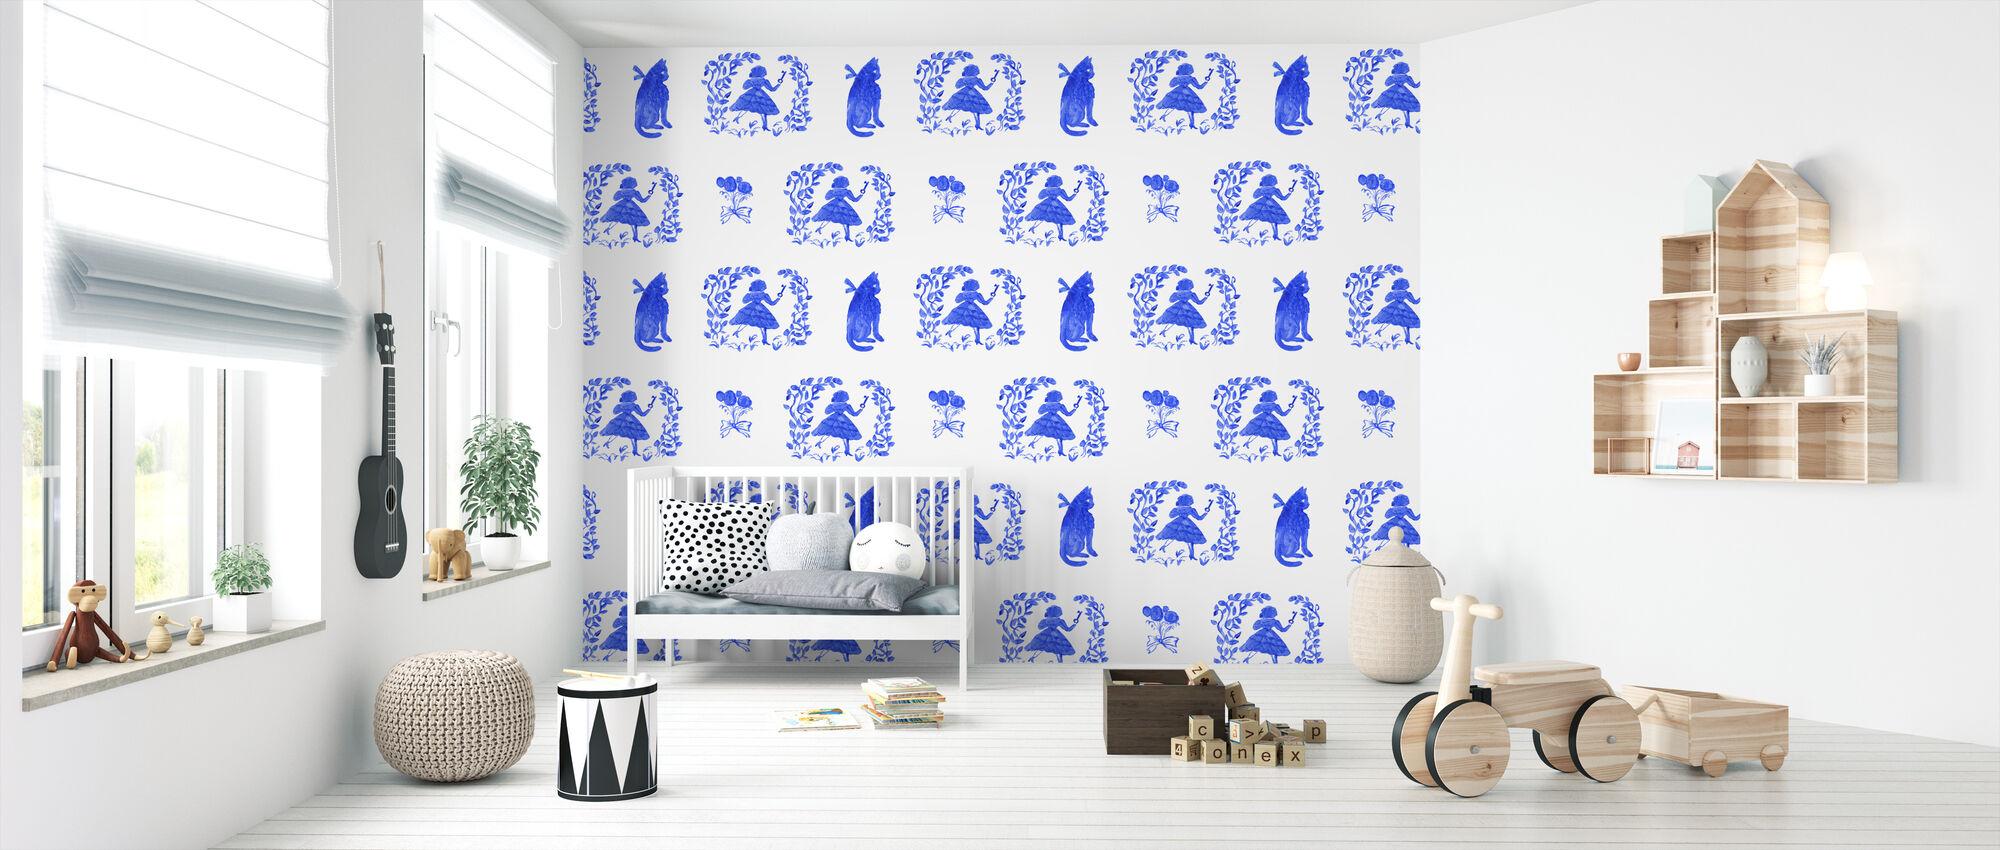 Hurry Alice - Wallpaper - Nursery